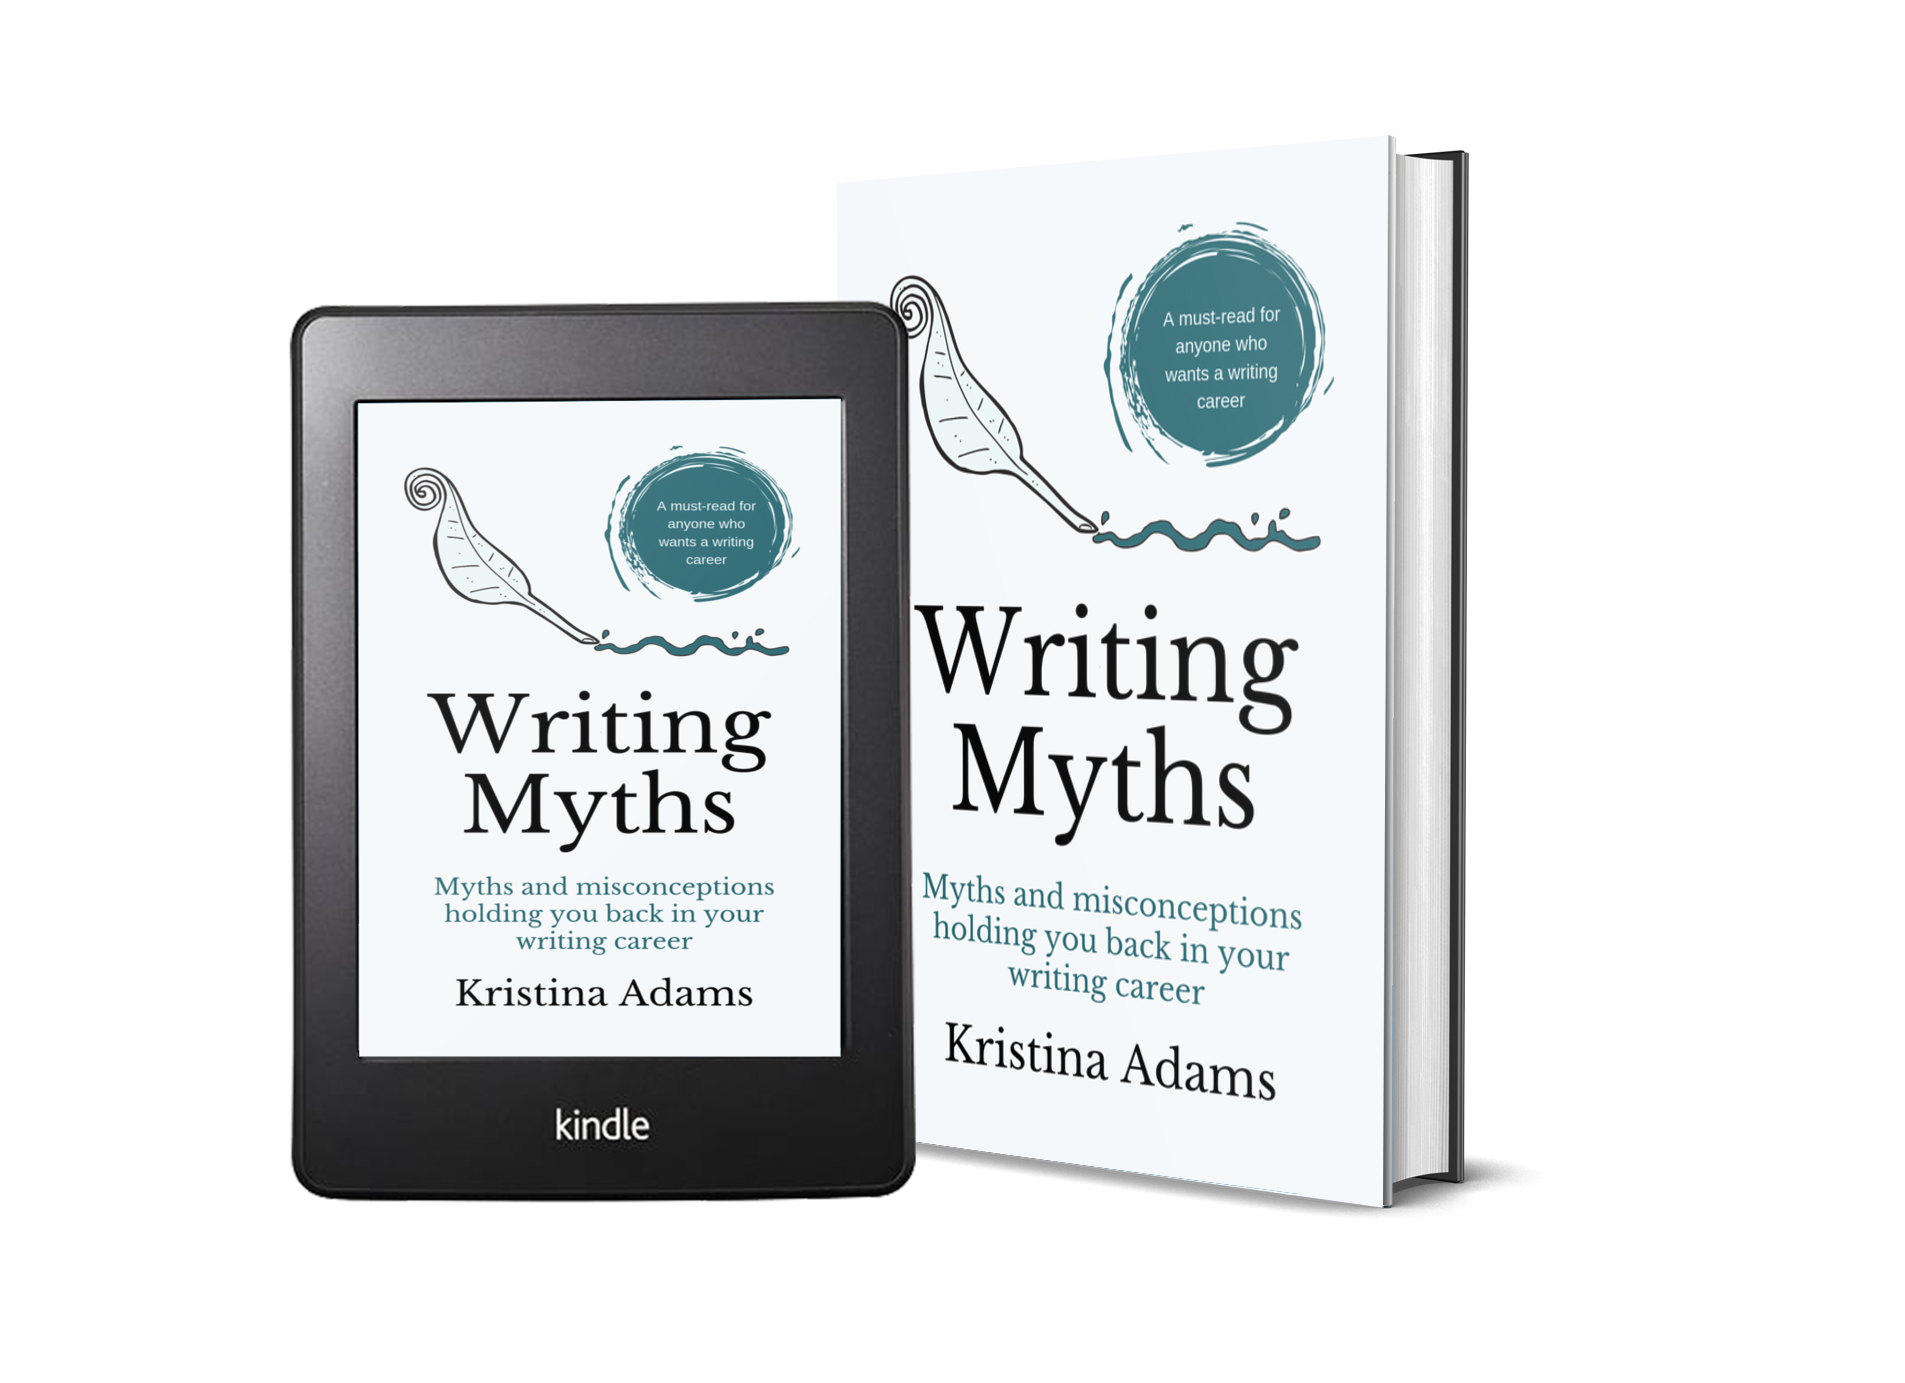 Writing Myths ebook and print cover mockup